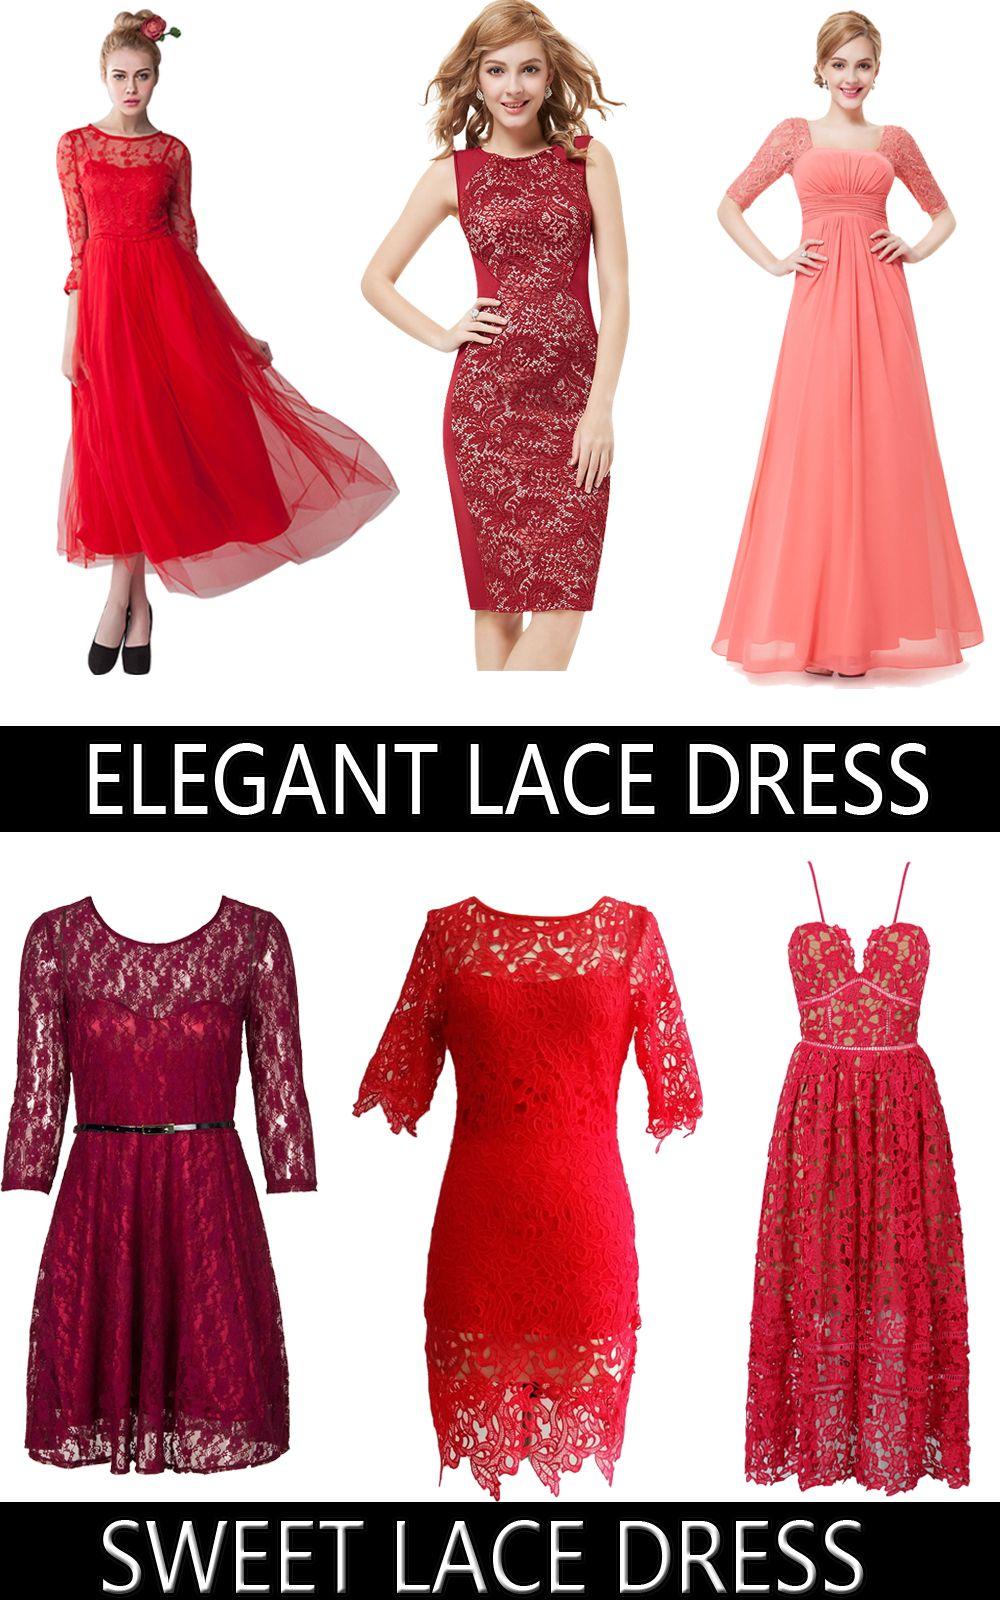 Red lace dressessweet or elegant you choose fashion pinterest